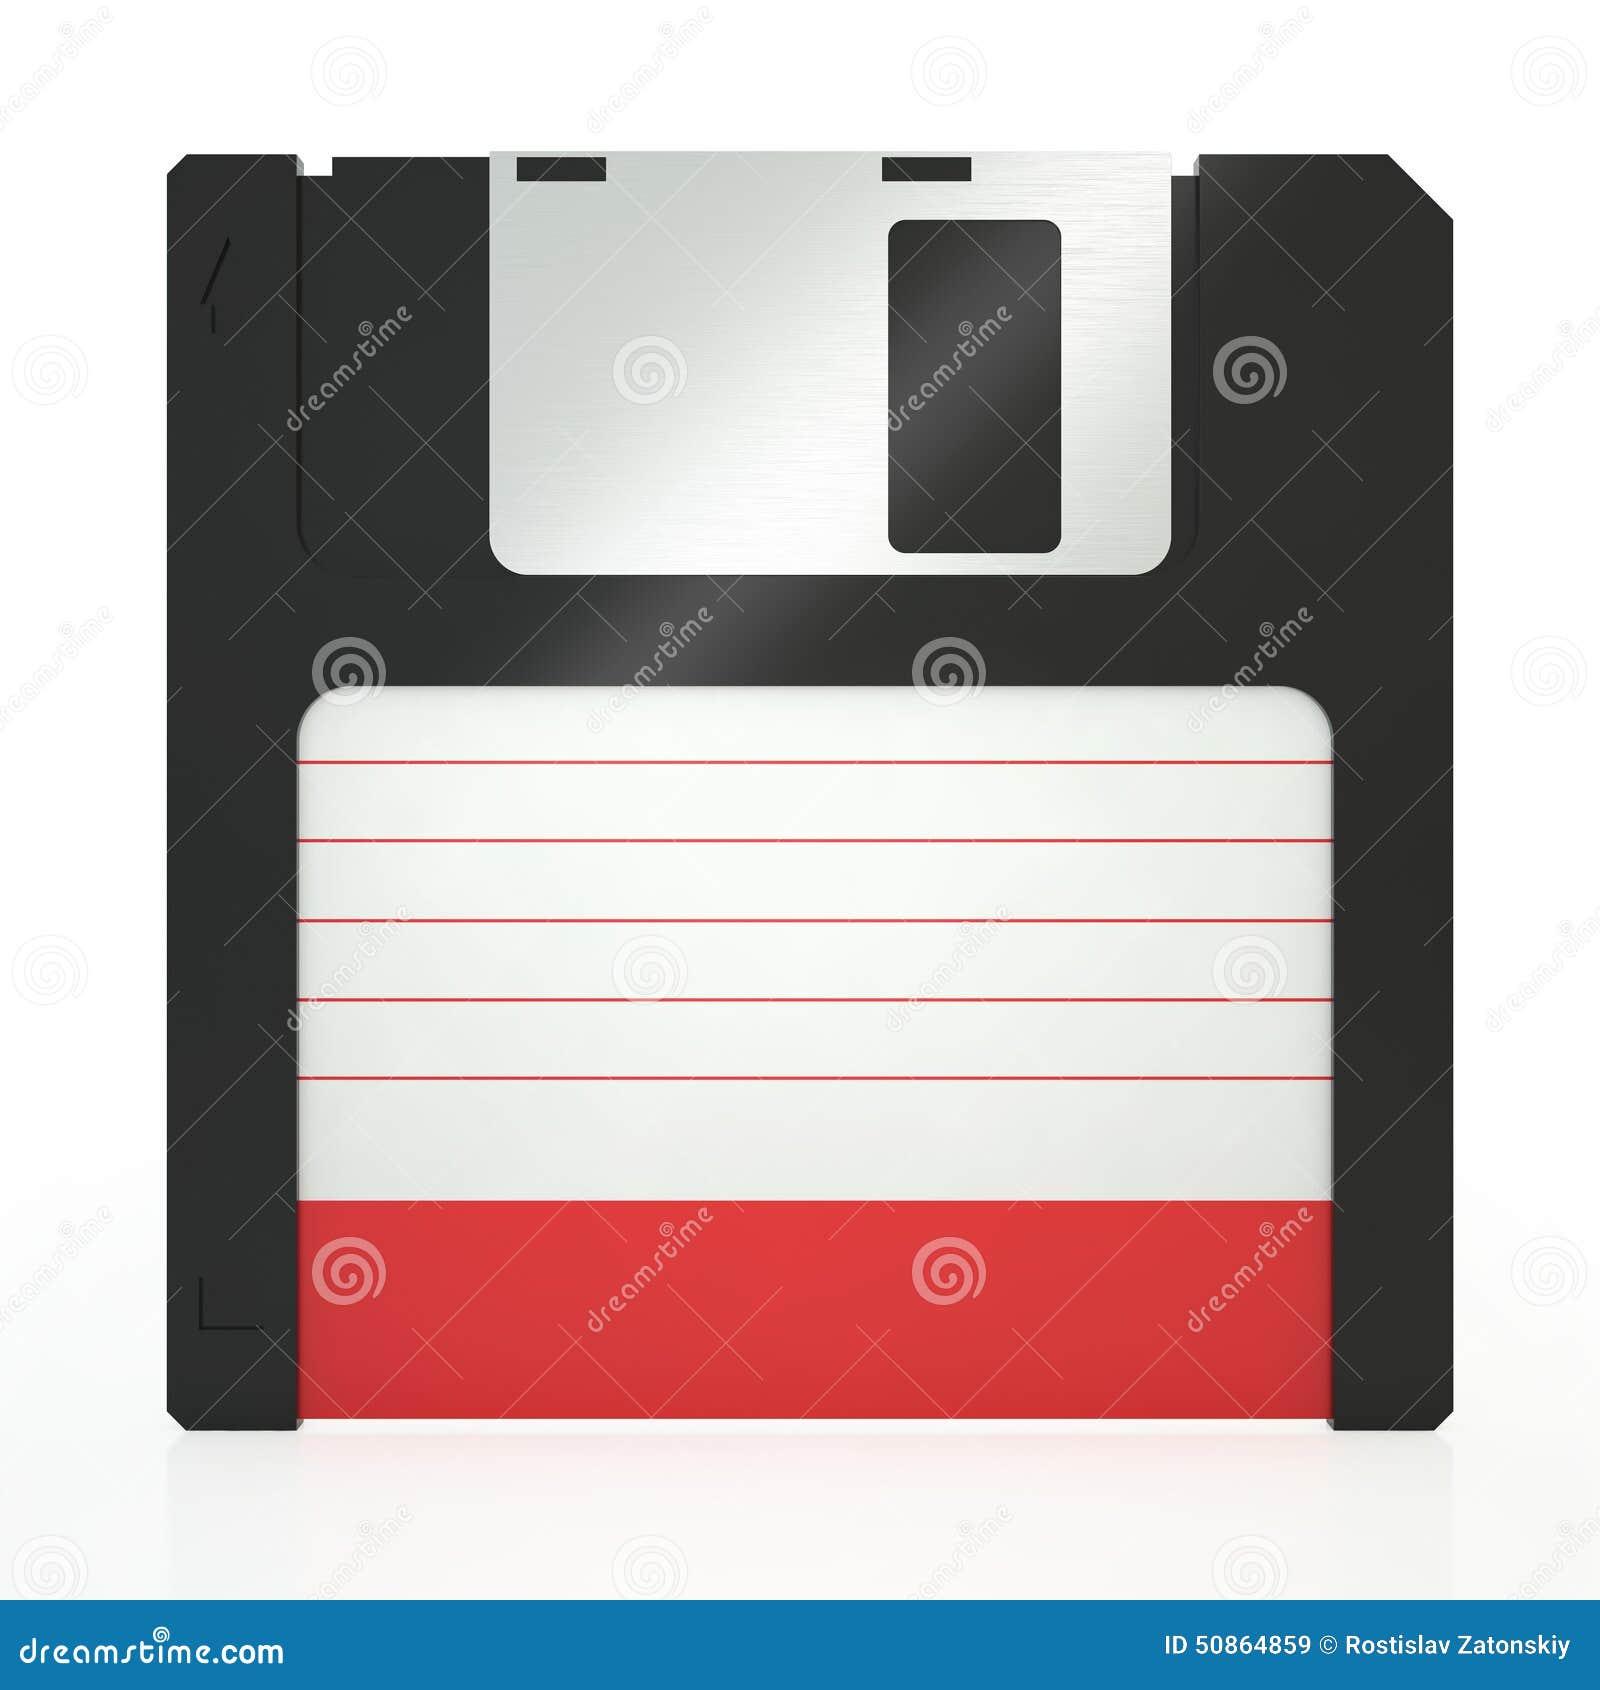 Illustrations old floppy disk stock illustration image - Uses for old floppy disks ...